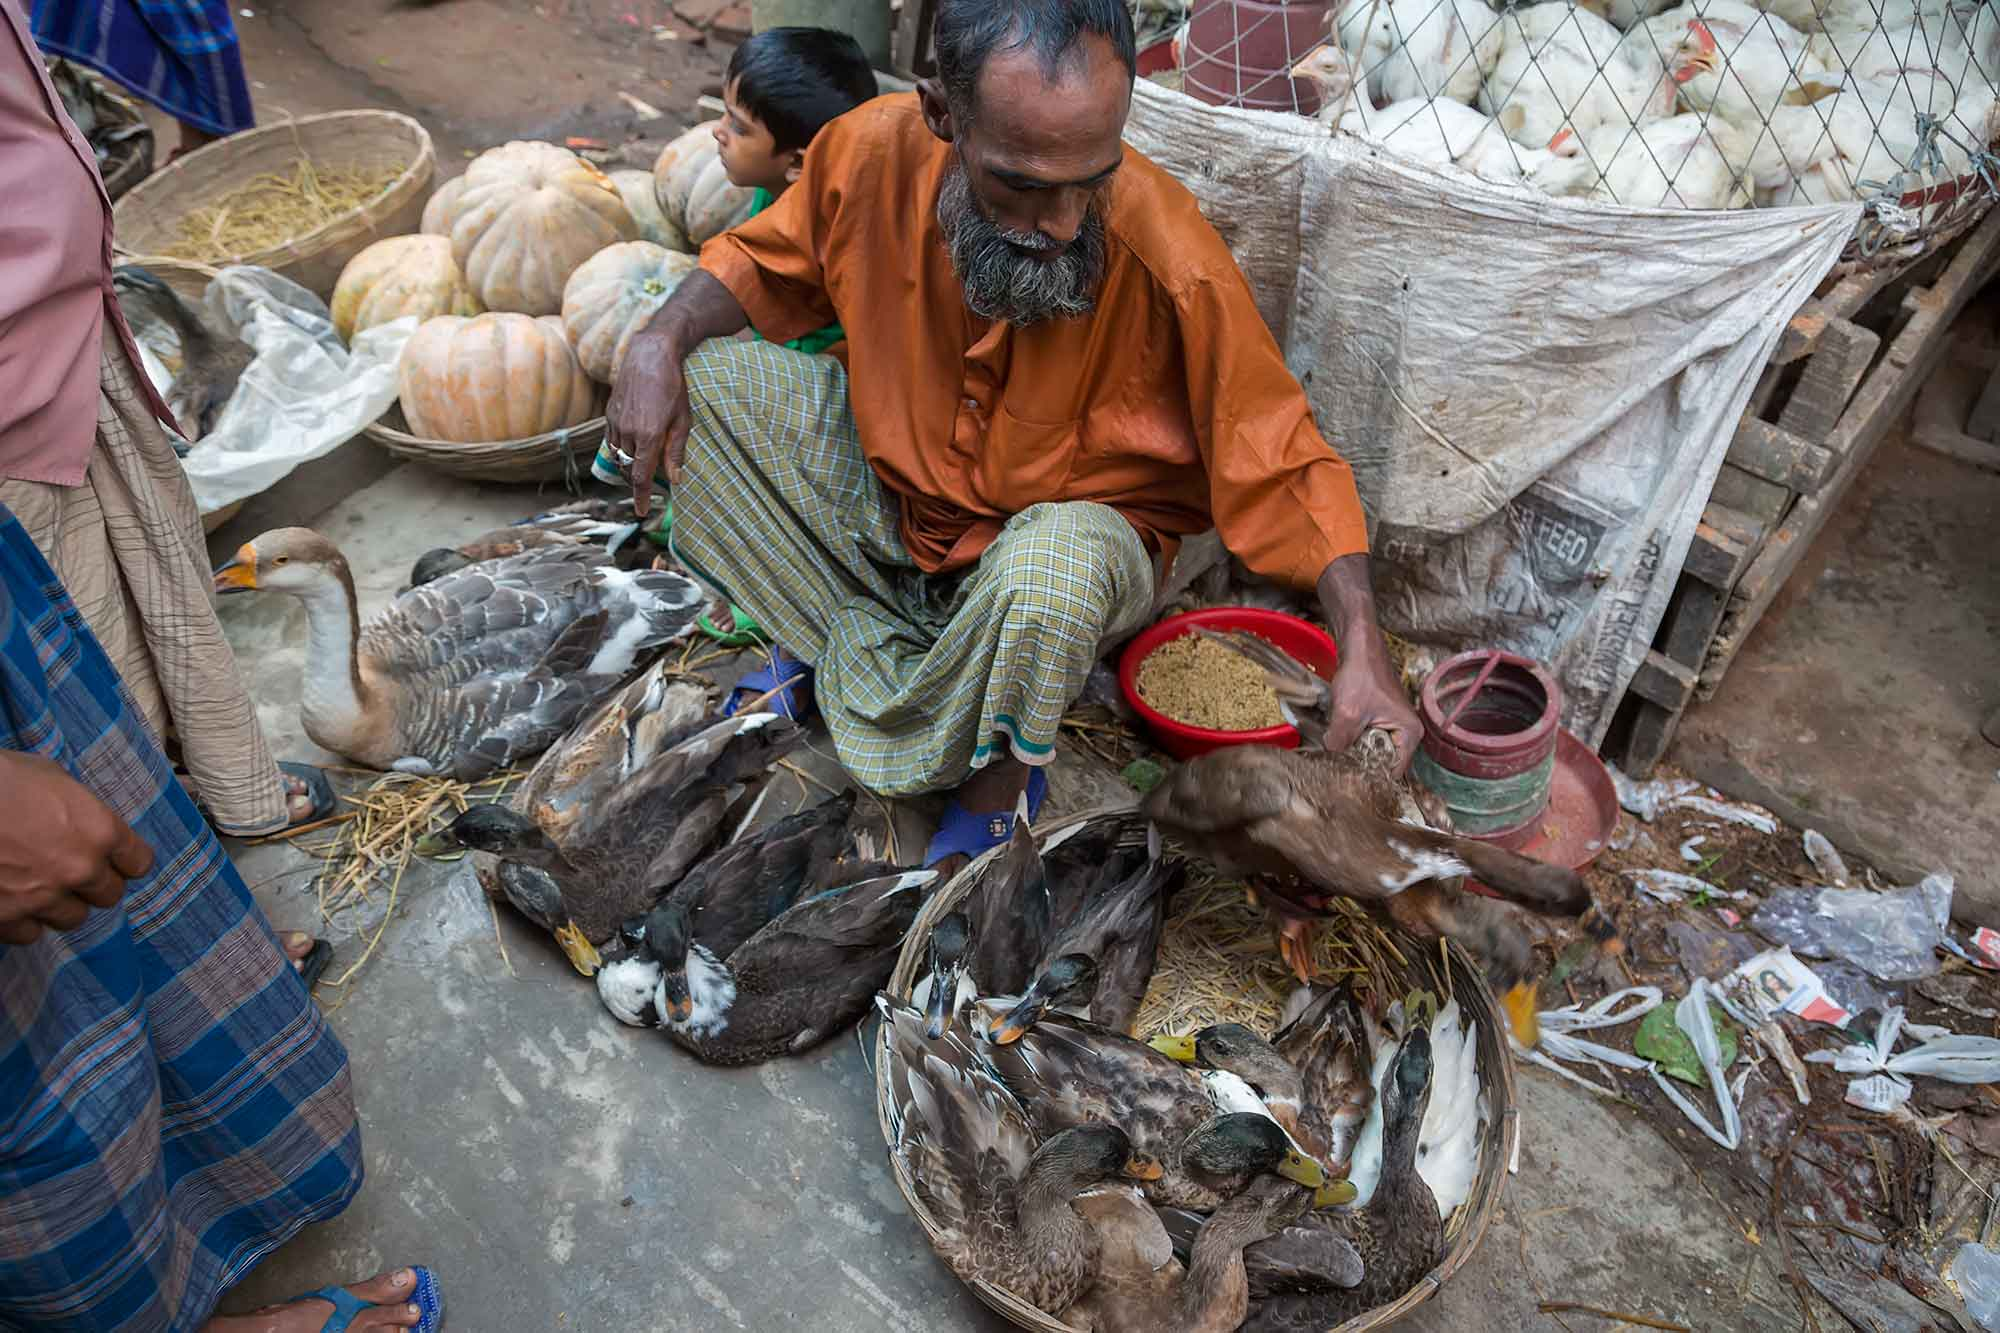 Man selling ducks in the streets of Dhaka, Bangladesh. © Ulli Maier & Nisa Maier